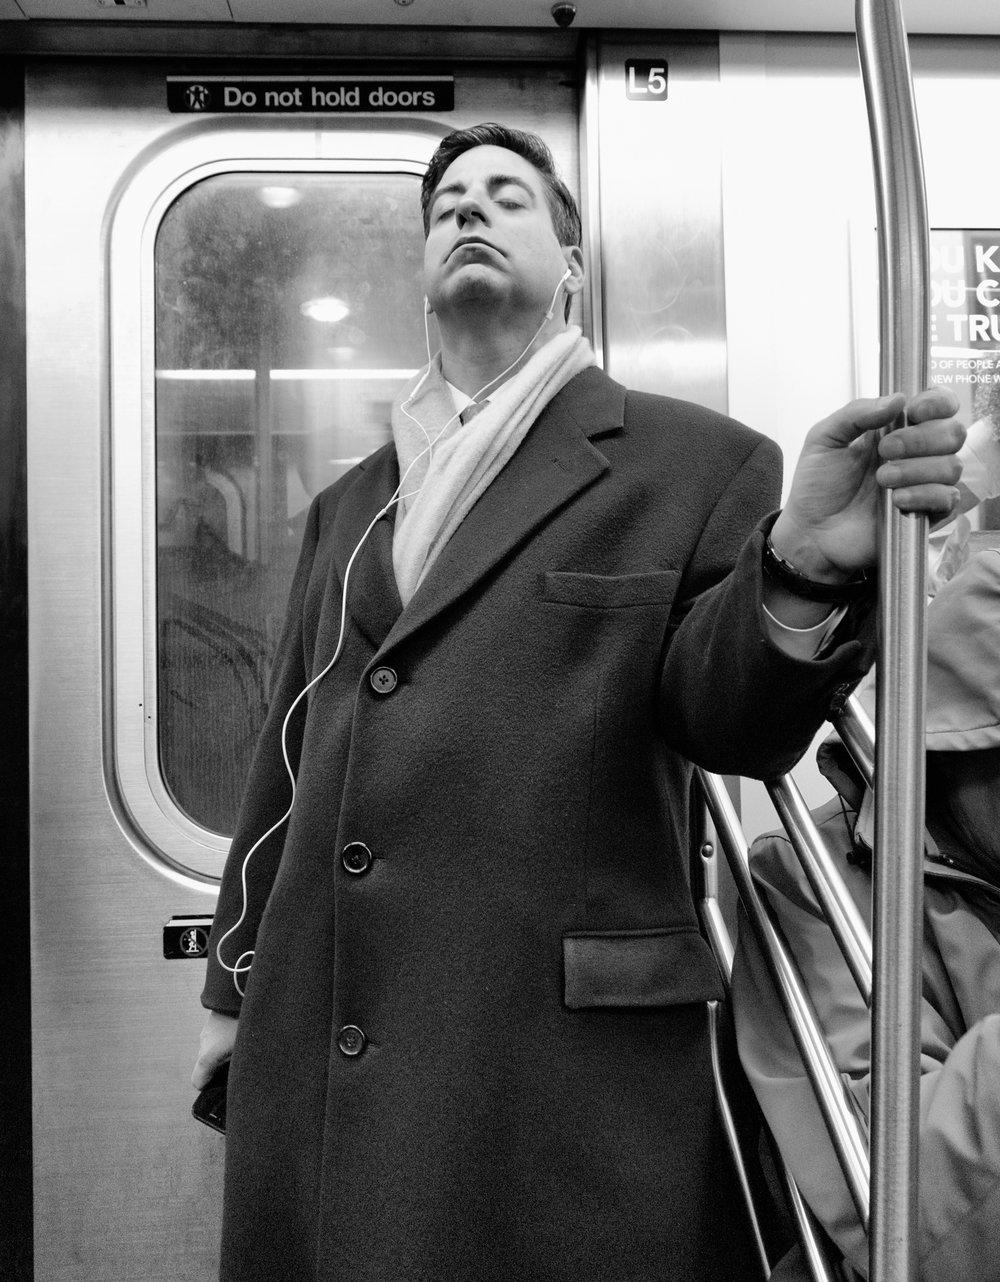 sloan_h_NYC_002.jpg